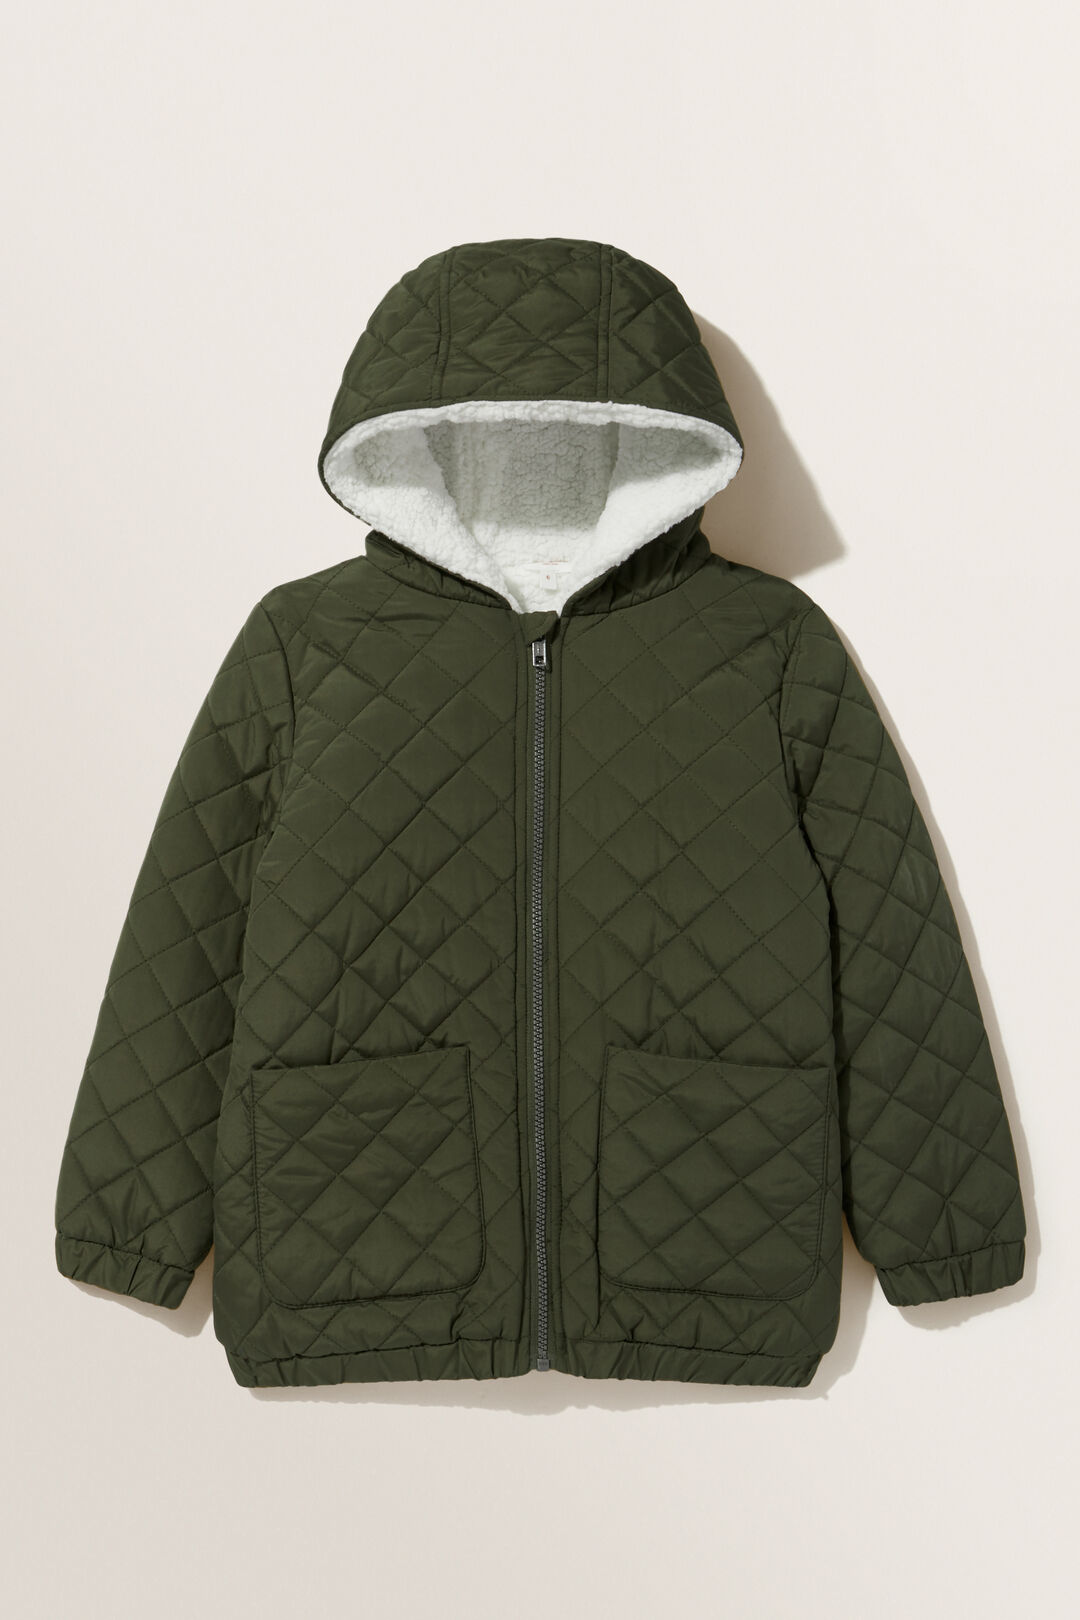 Sherpa Lined Jacket  FOREST  hi-res